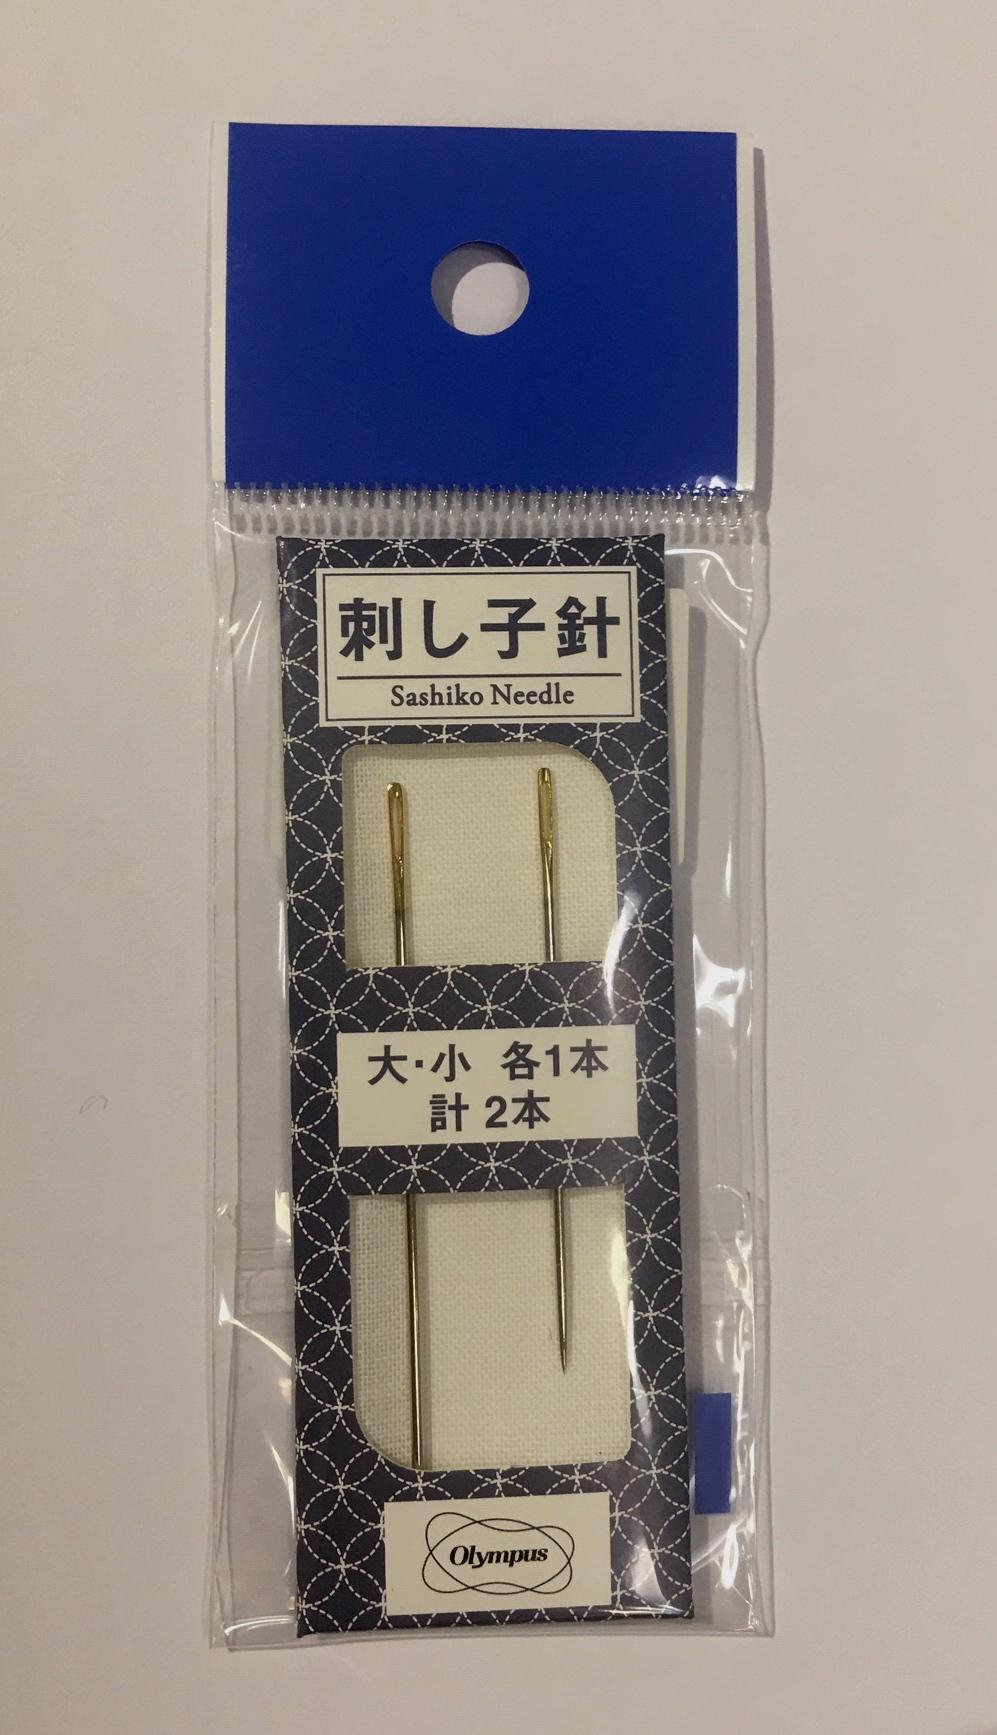 olympus sashiko needles two pack